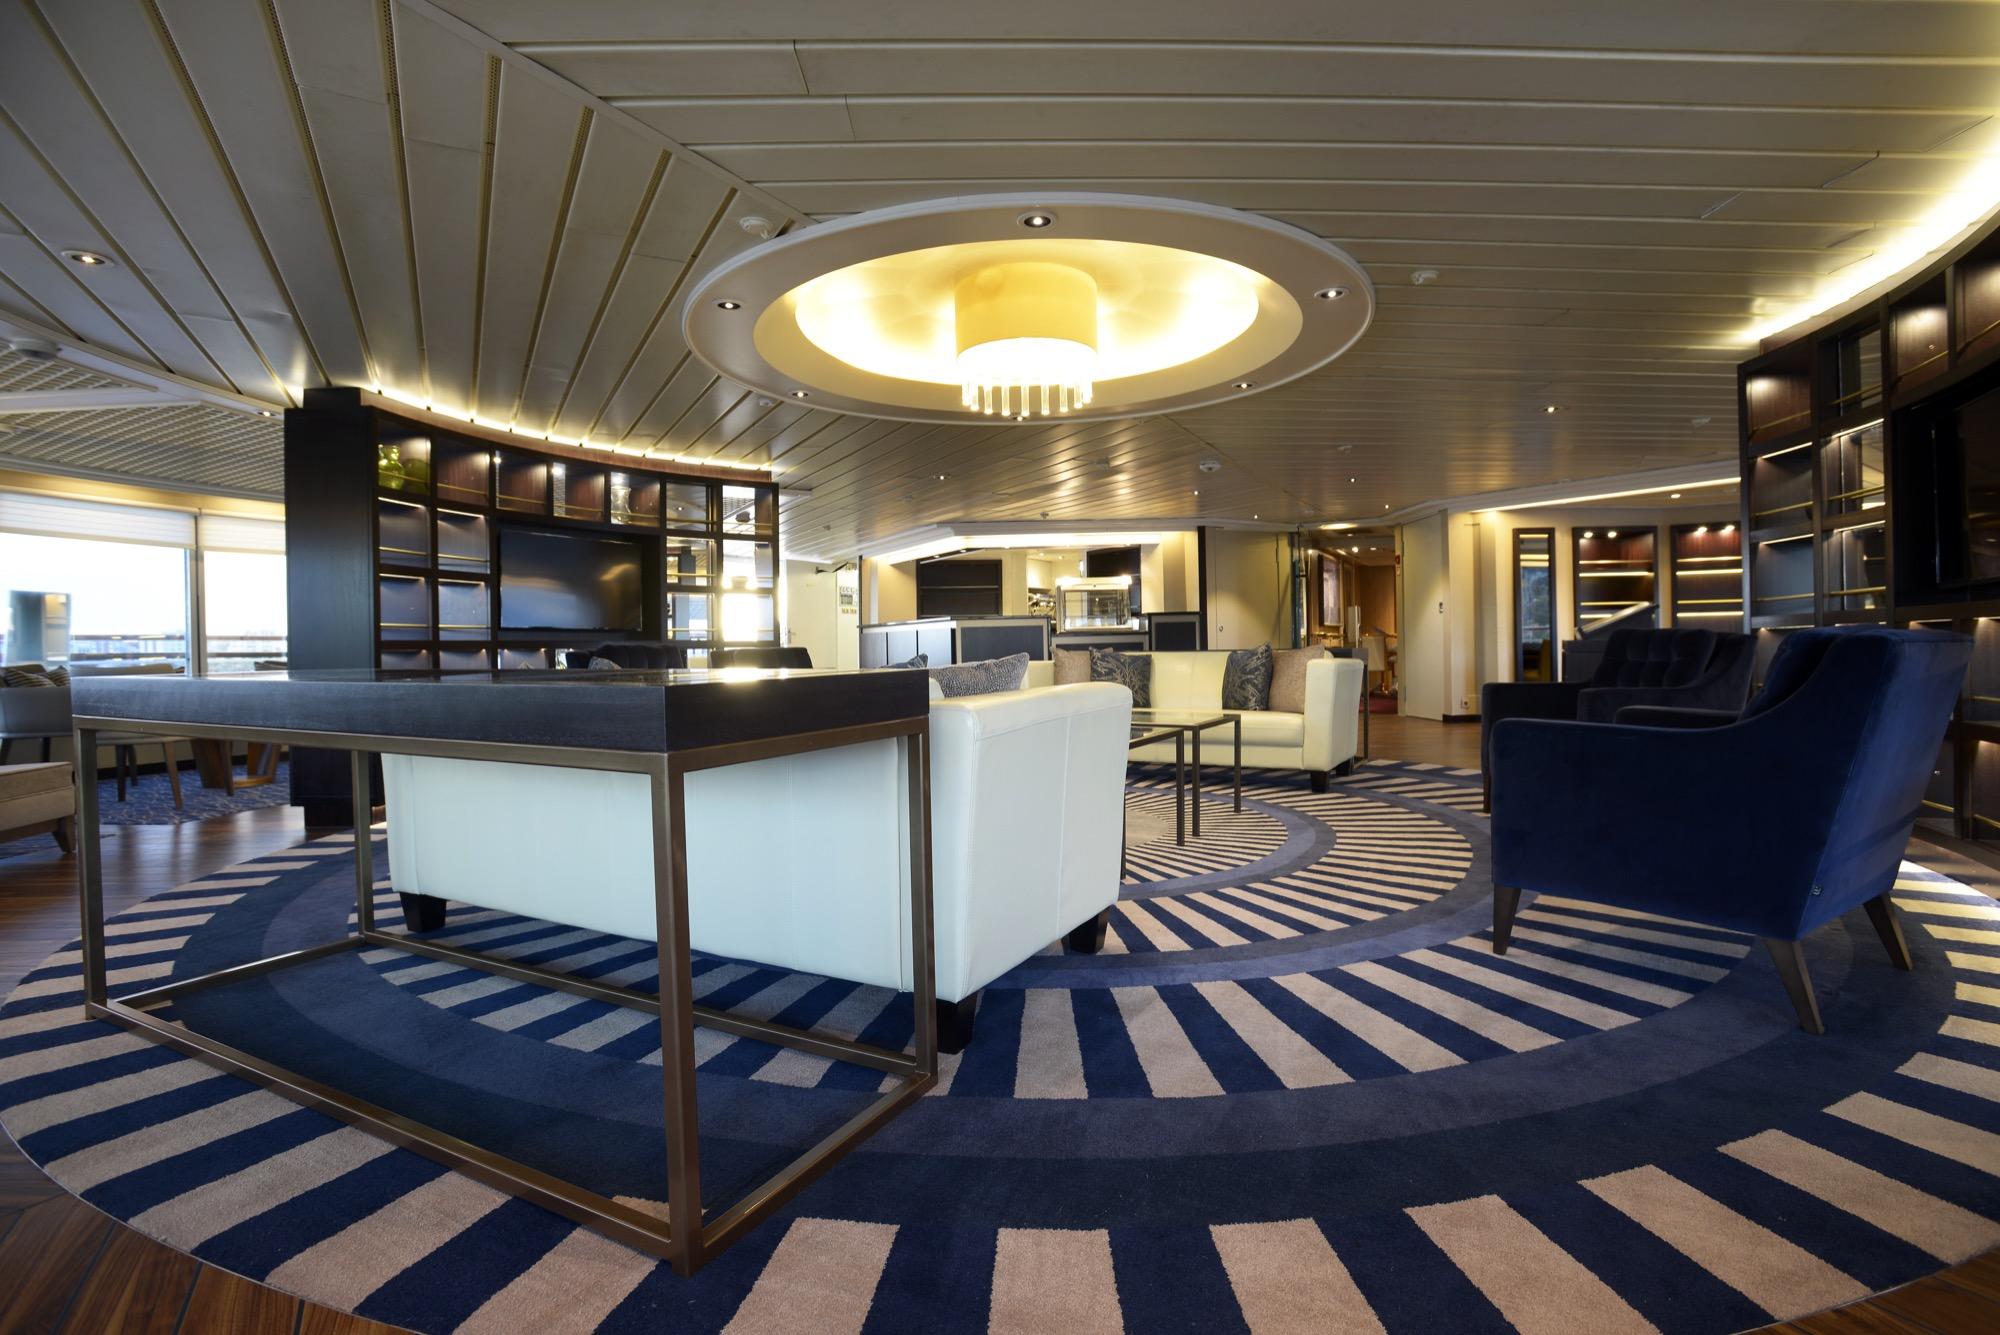 Windstar Star Pride Interior Yacht Club 12.jpg